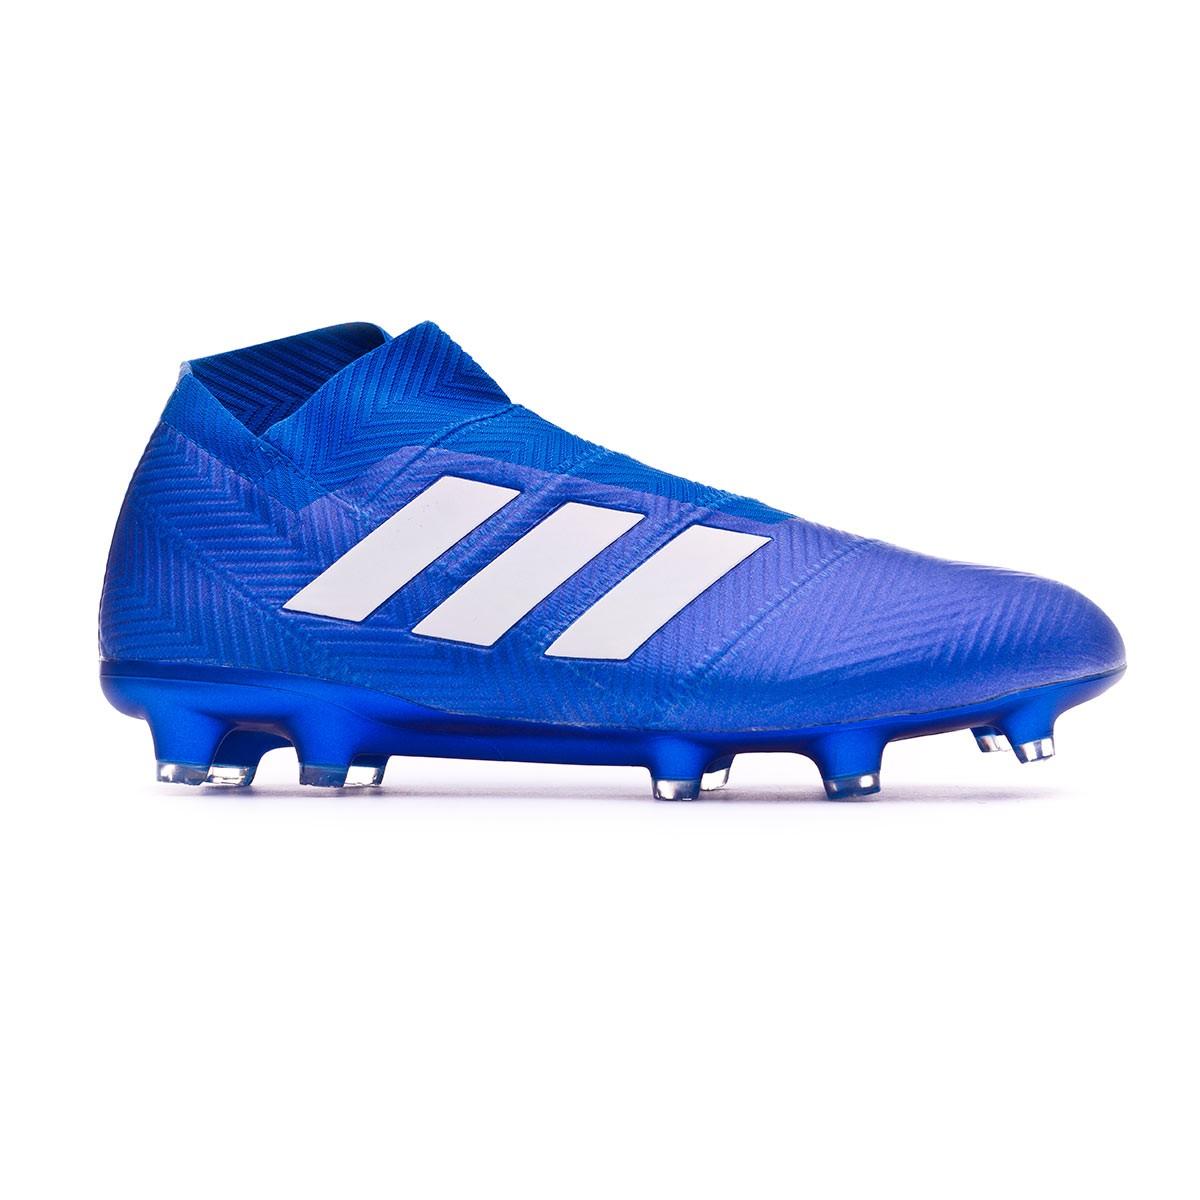 a9e51aebf572 Football Boots adidas Nemeziz 18+ FG Football blue-White - Tienda de fútbol  Fútbol Emotion